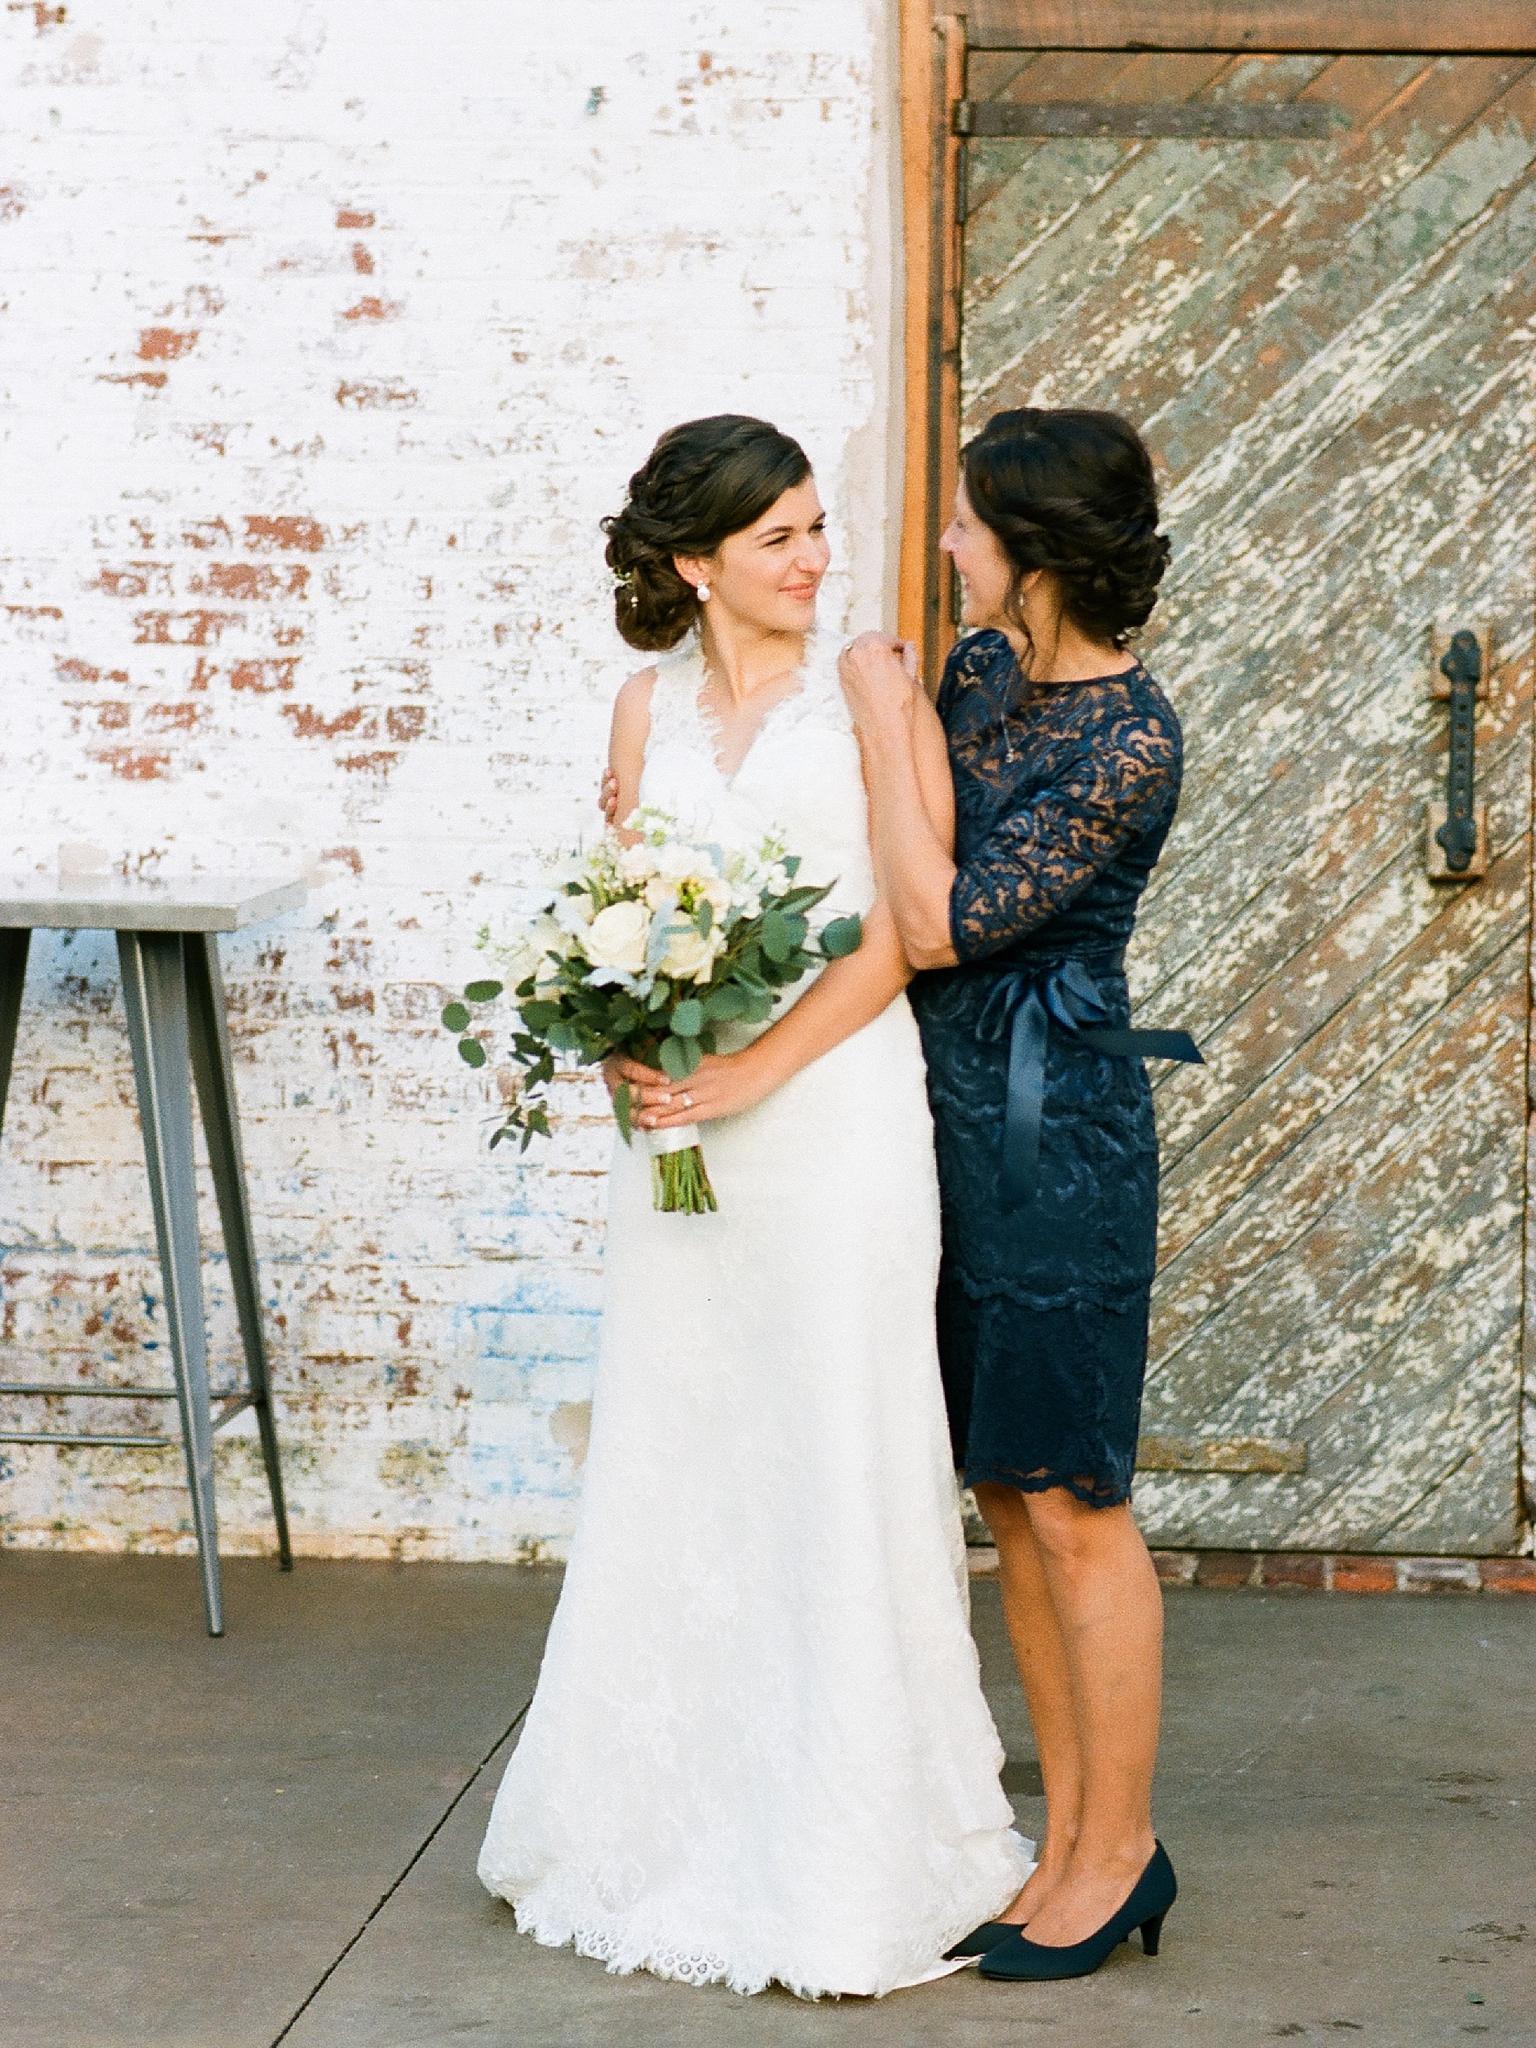 The Engine Room Atlanta Wedding Photographer Christina Pugh 19.jpg